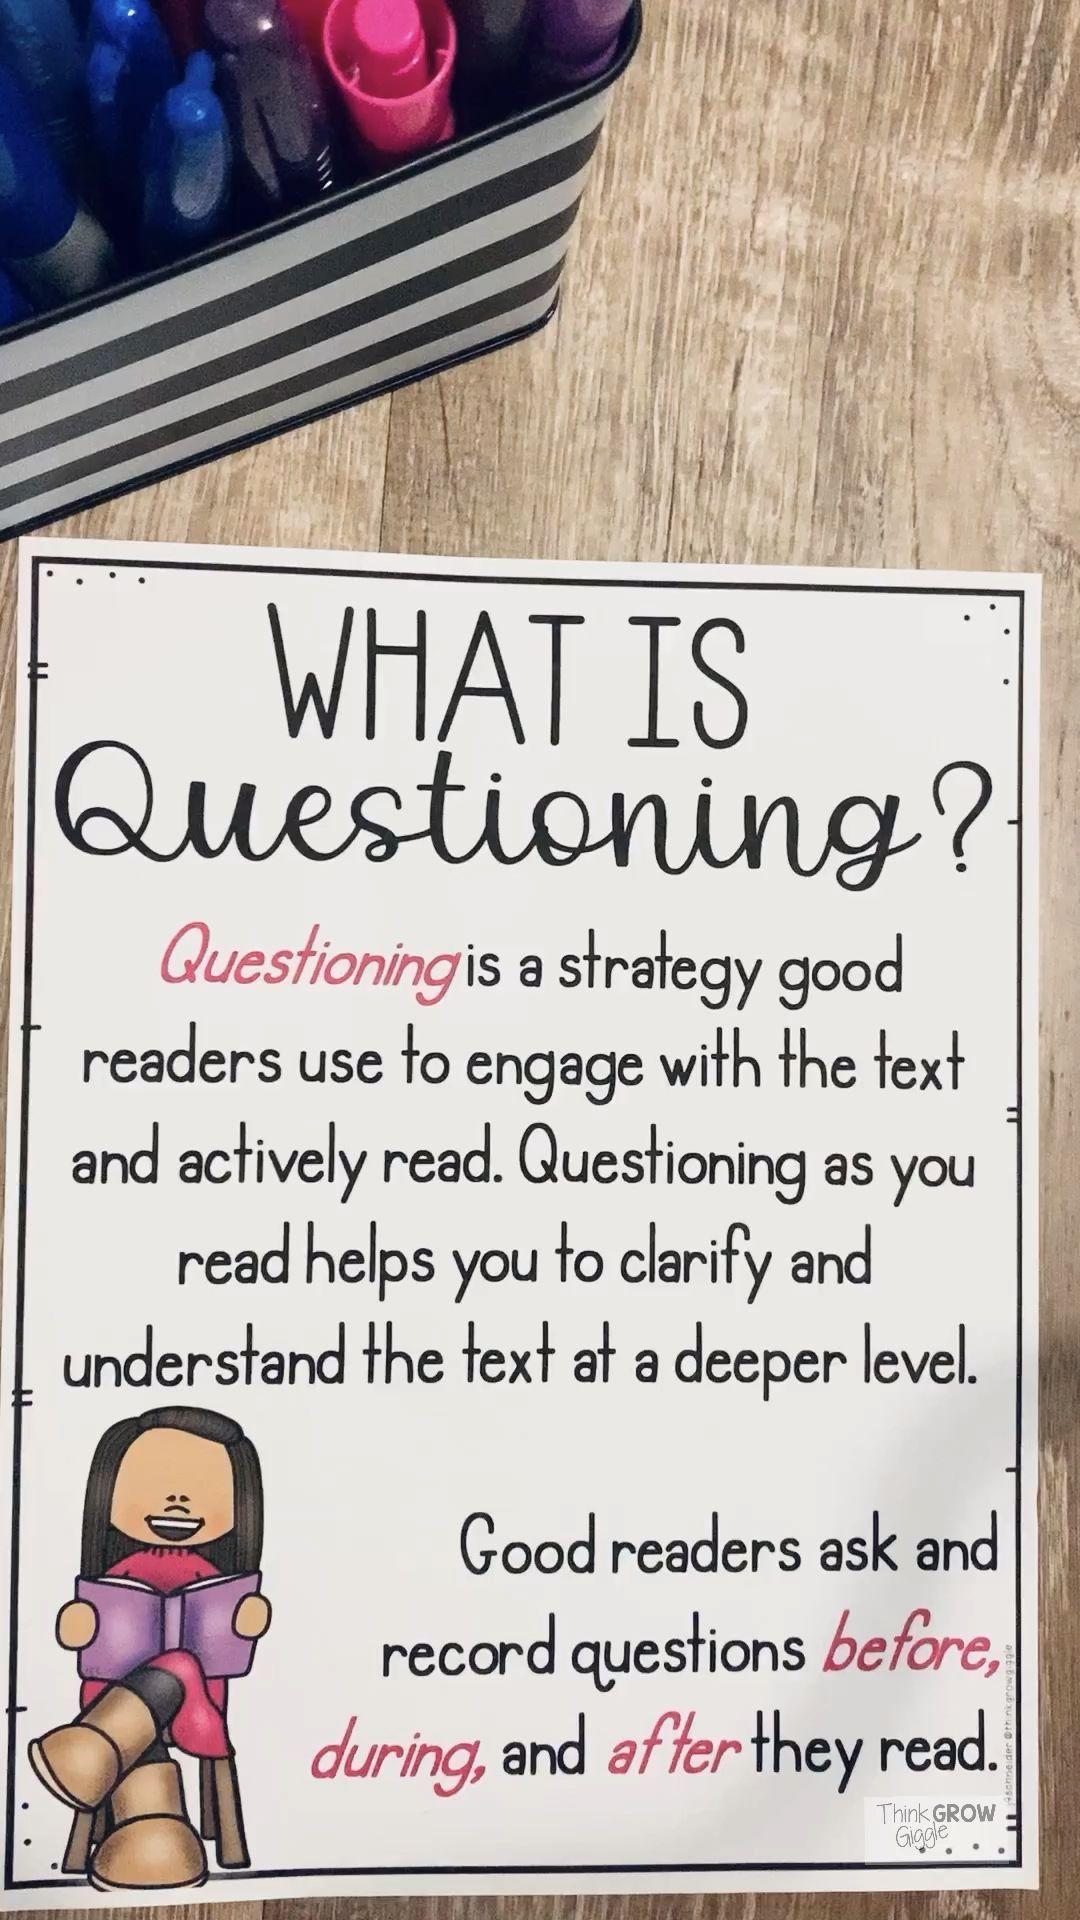 Are You Looking For Activities To Help Your Grade 3 4 And 5 Students Understand The Rea En 2020 Strategies De Lecture Question Strategies De Comprehension De Lecture [ 1920 x 1080 Pixel ]